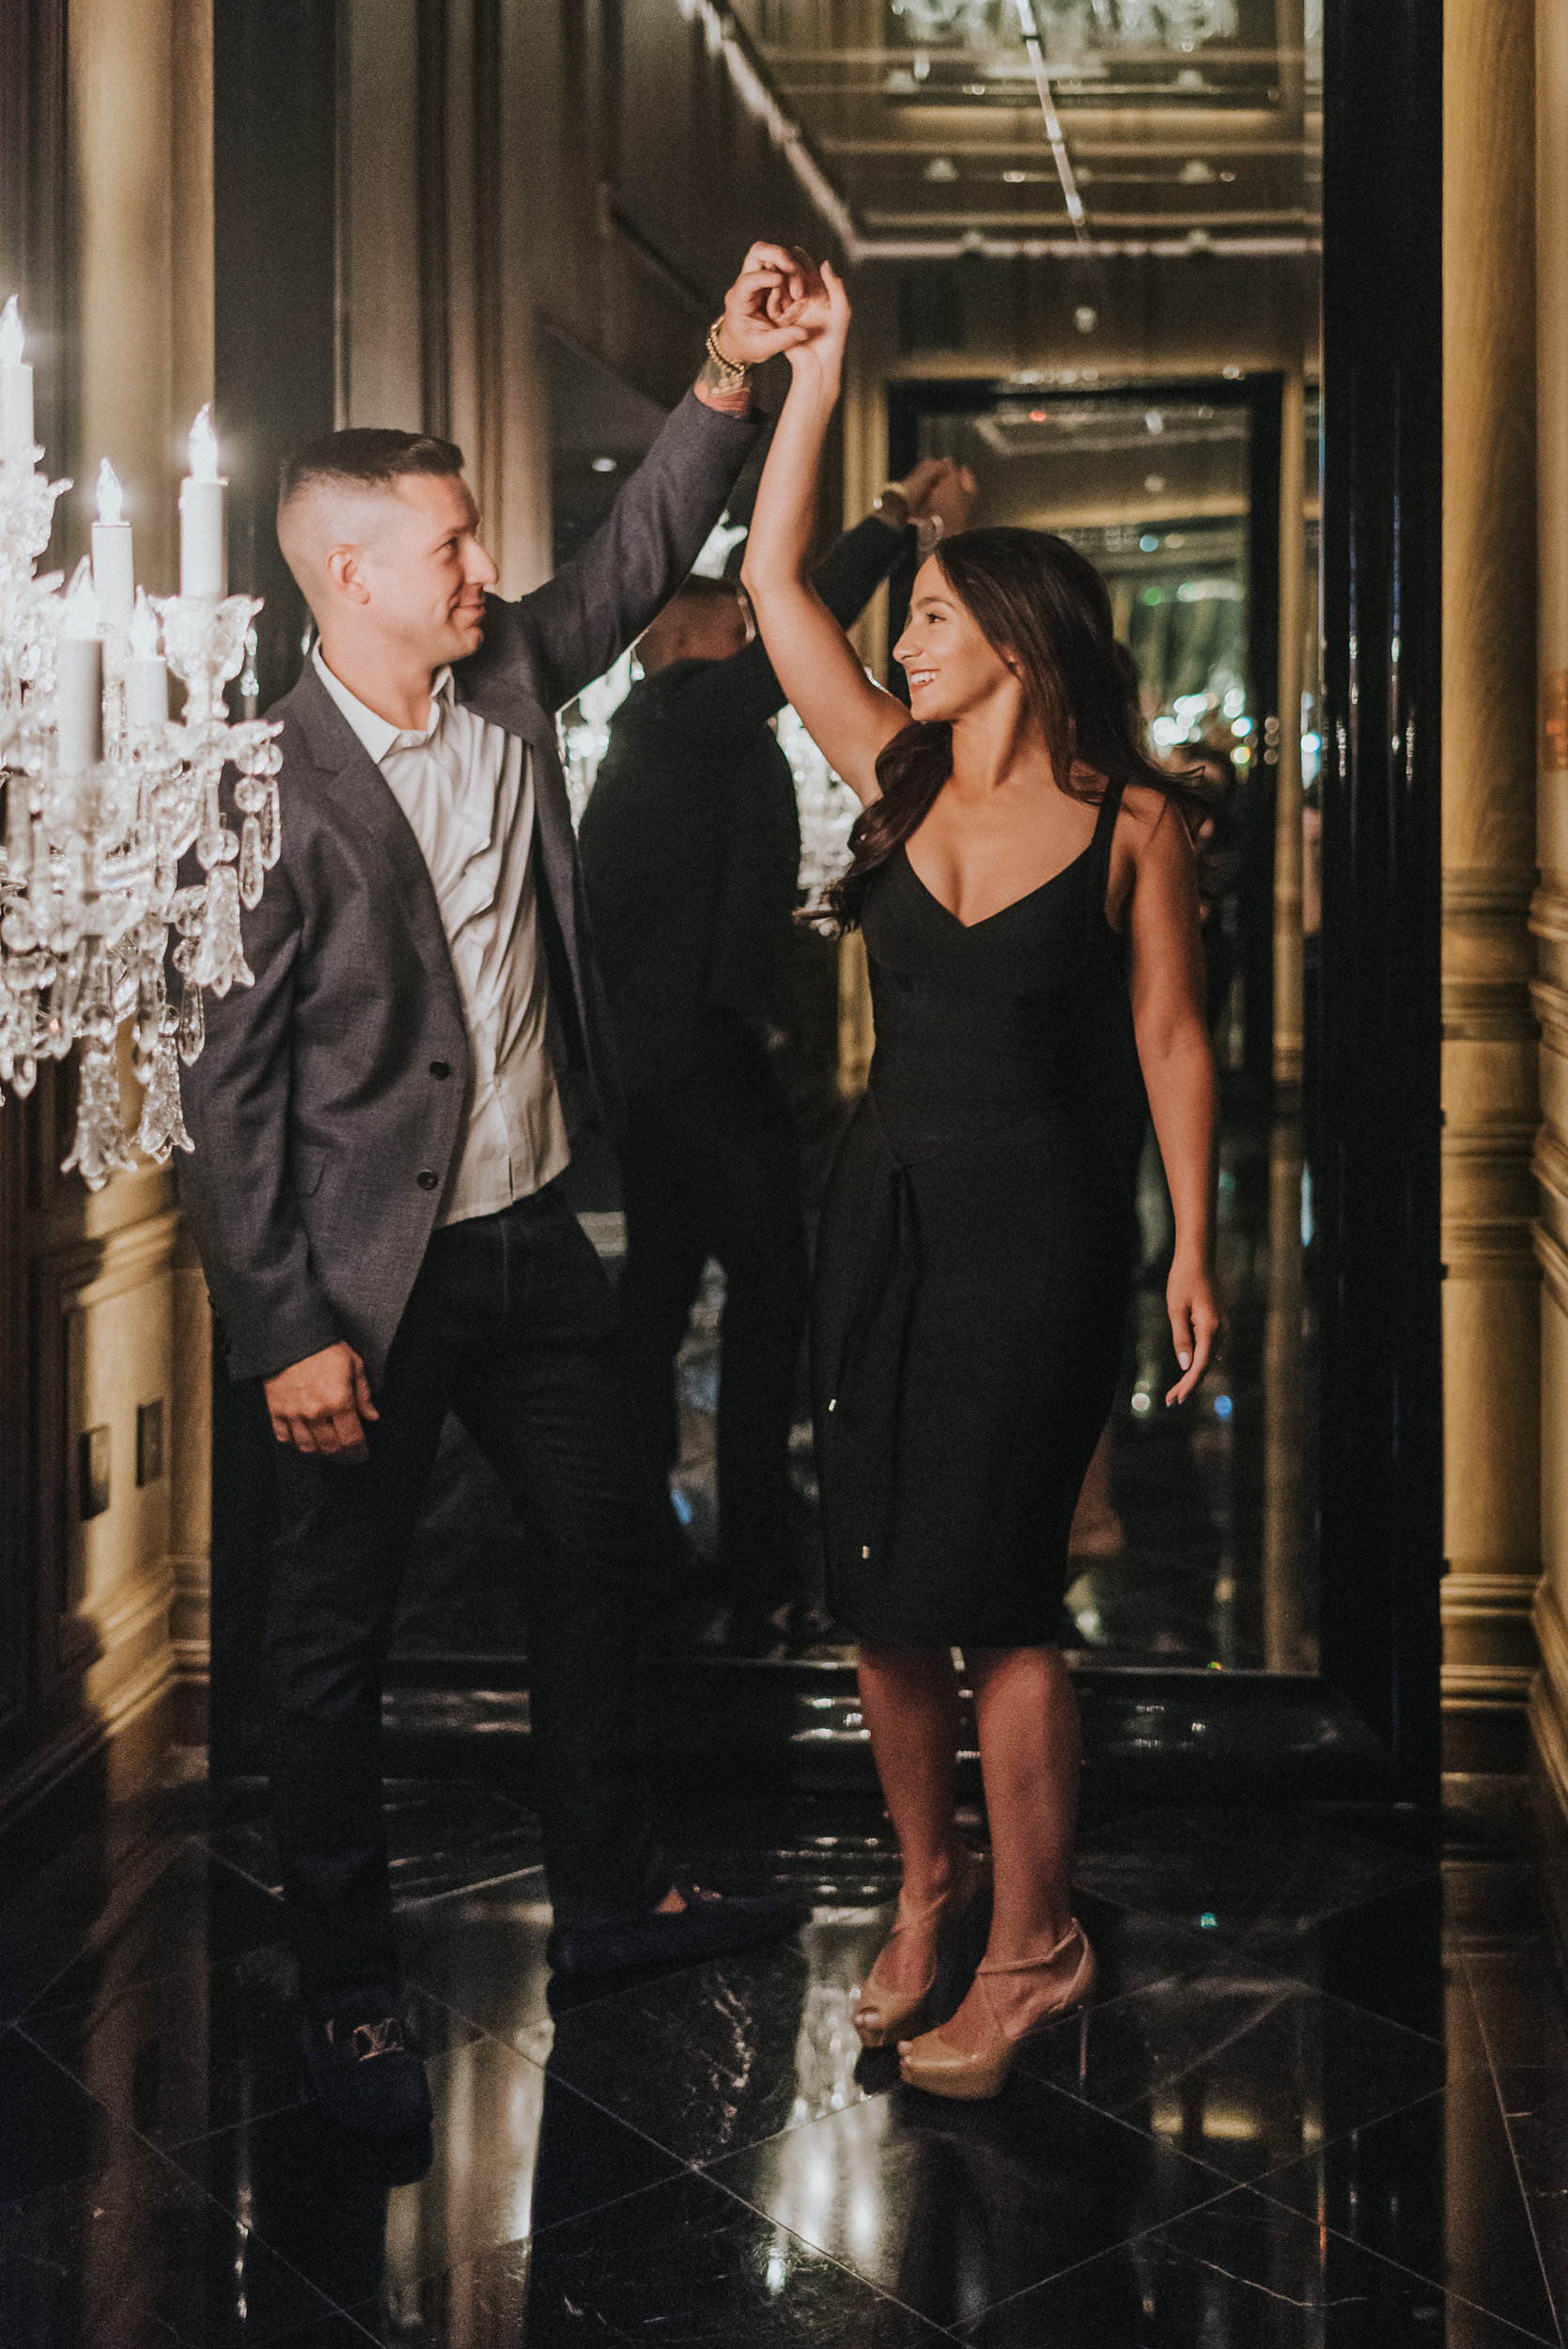 JOHN & SAMANTHA BACCARAT HOTEL PROPOSAL NYC NEW YORK (6_).jpg